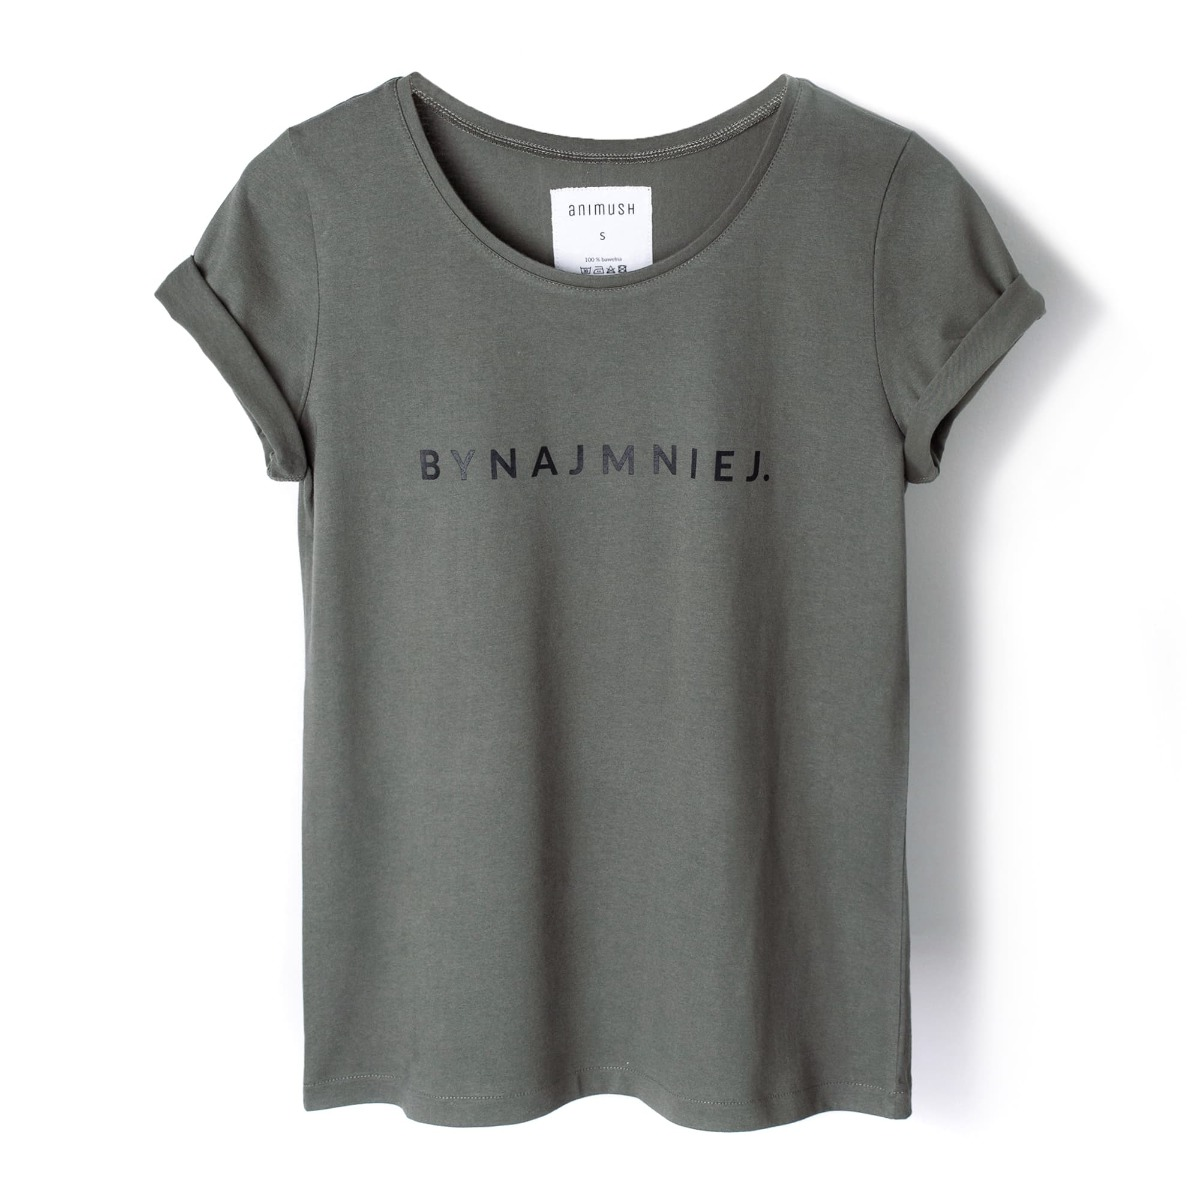 T-shirt khaki BYNAJMNIEJ.